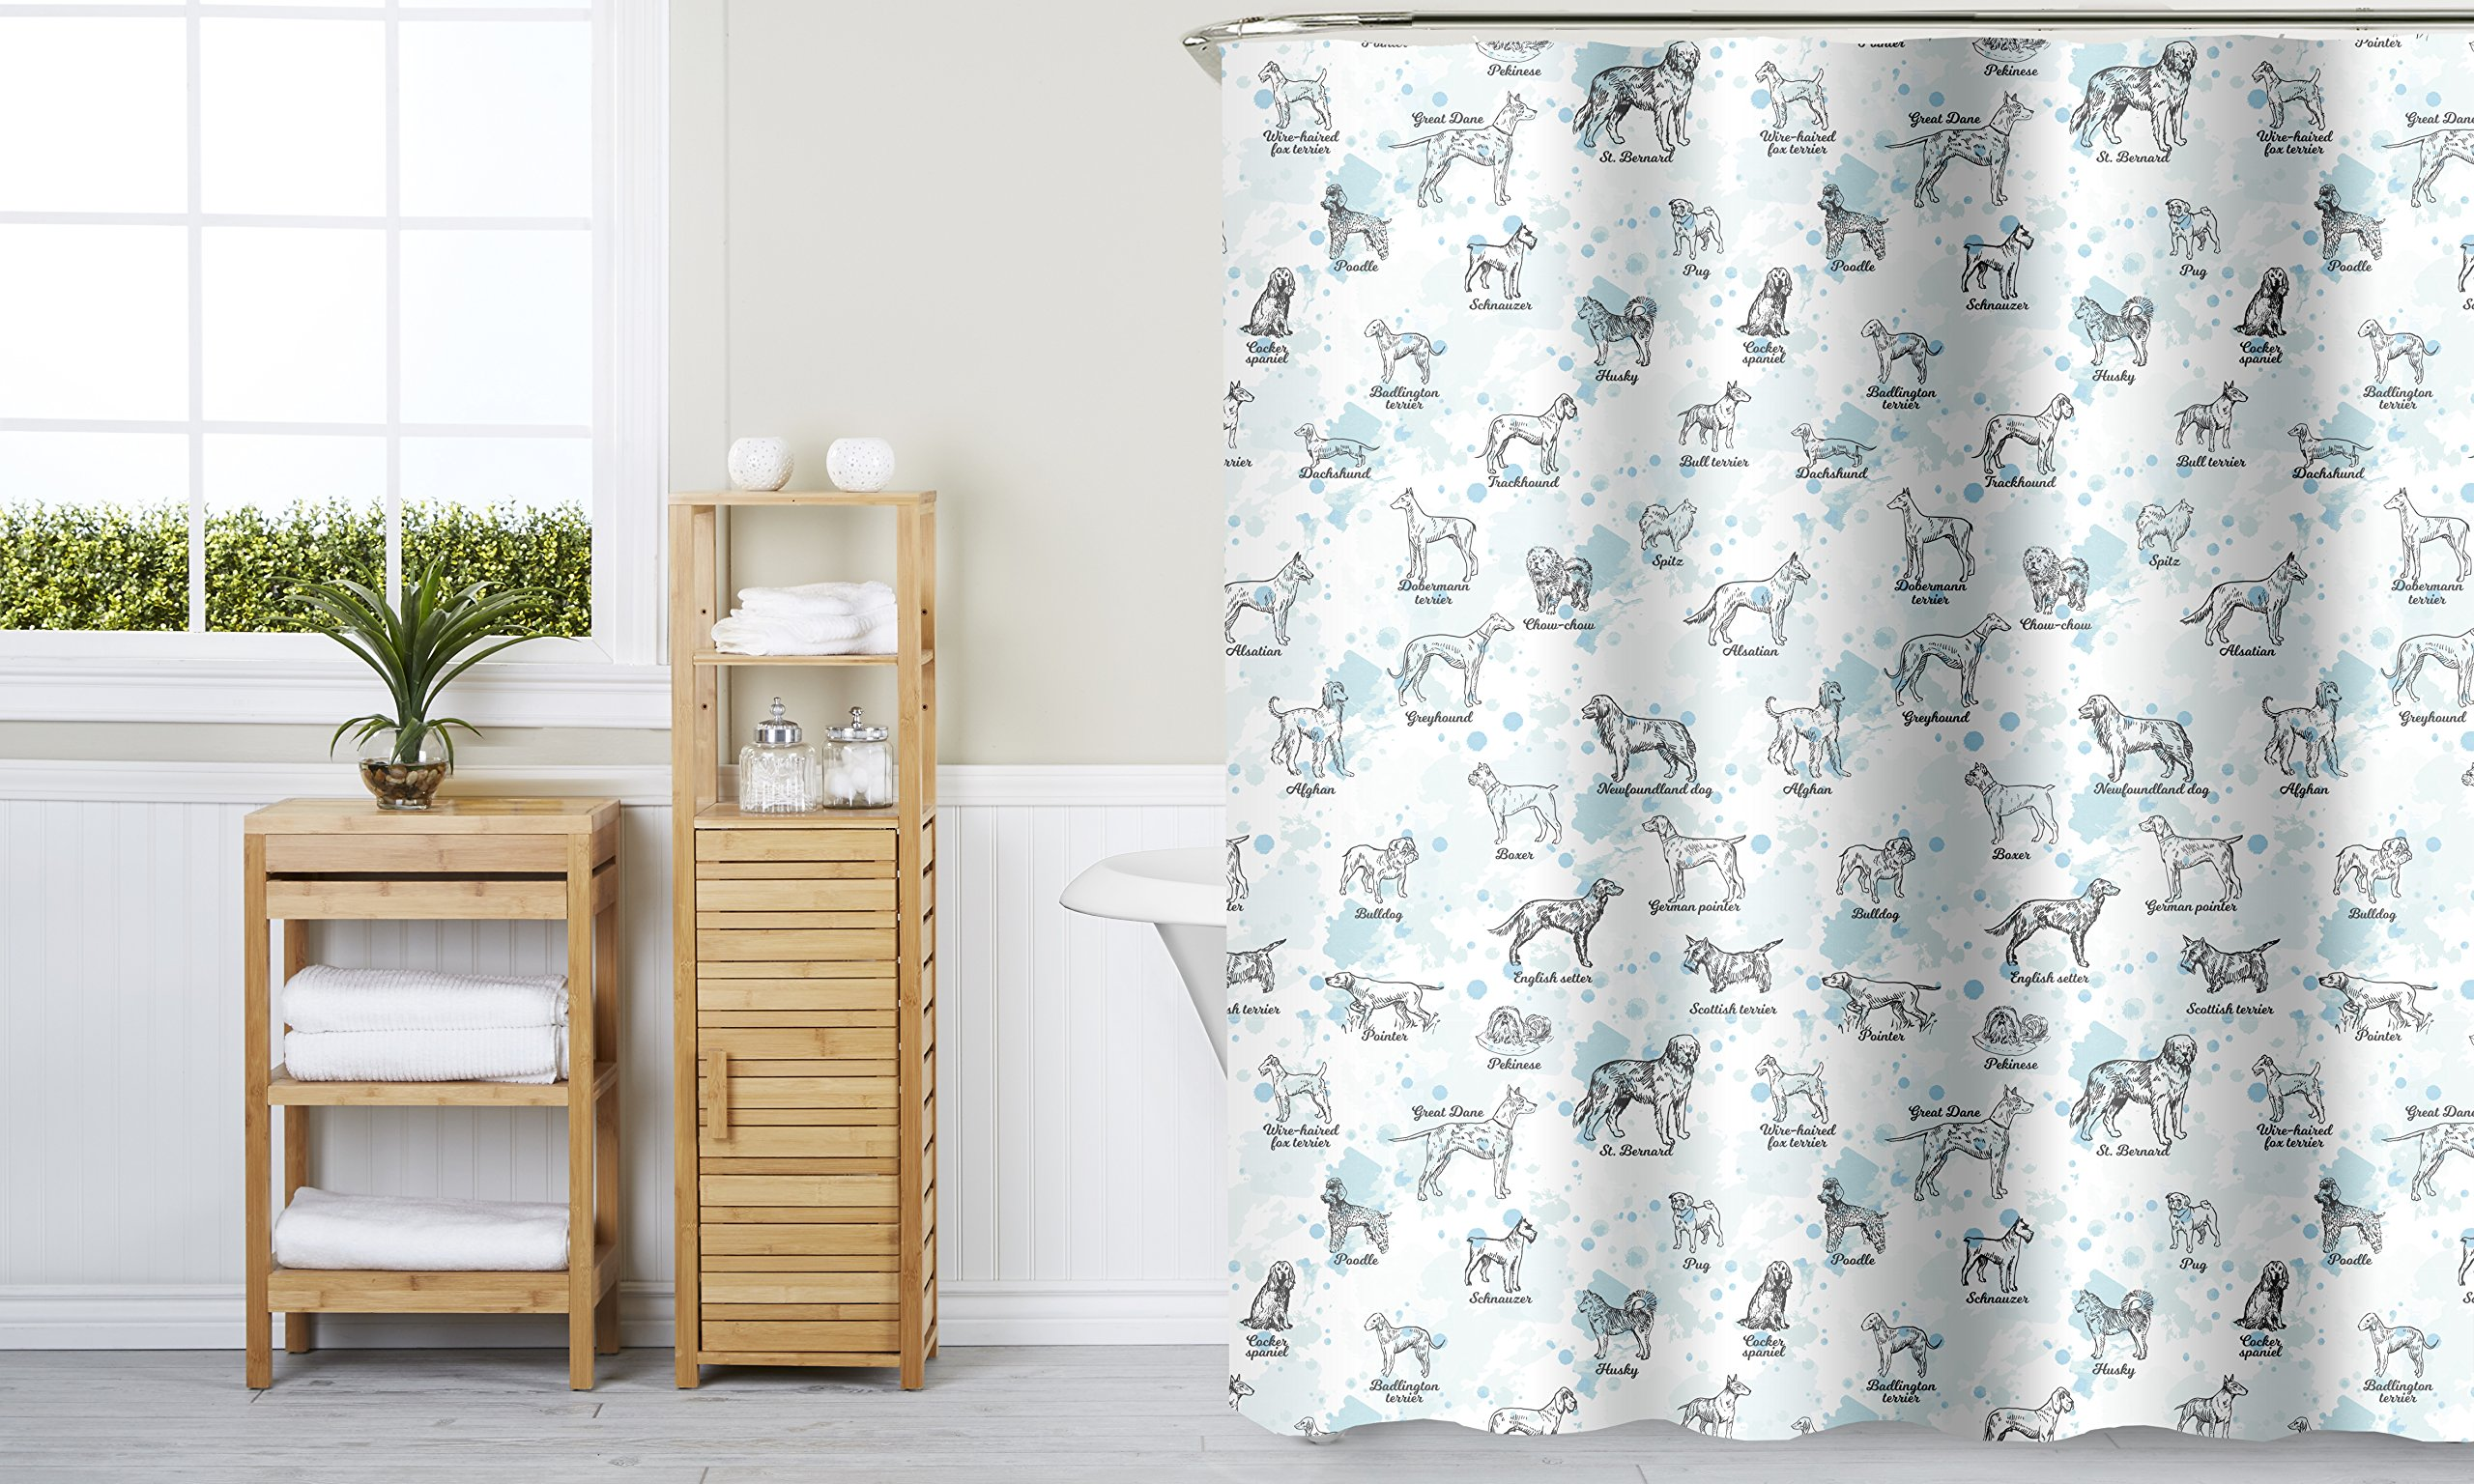 Indecor Home Fabric Hooks-Dog Breeds Shower Curtain, Multi